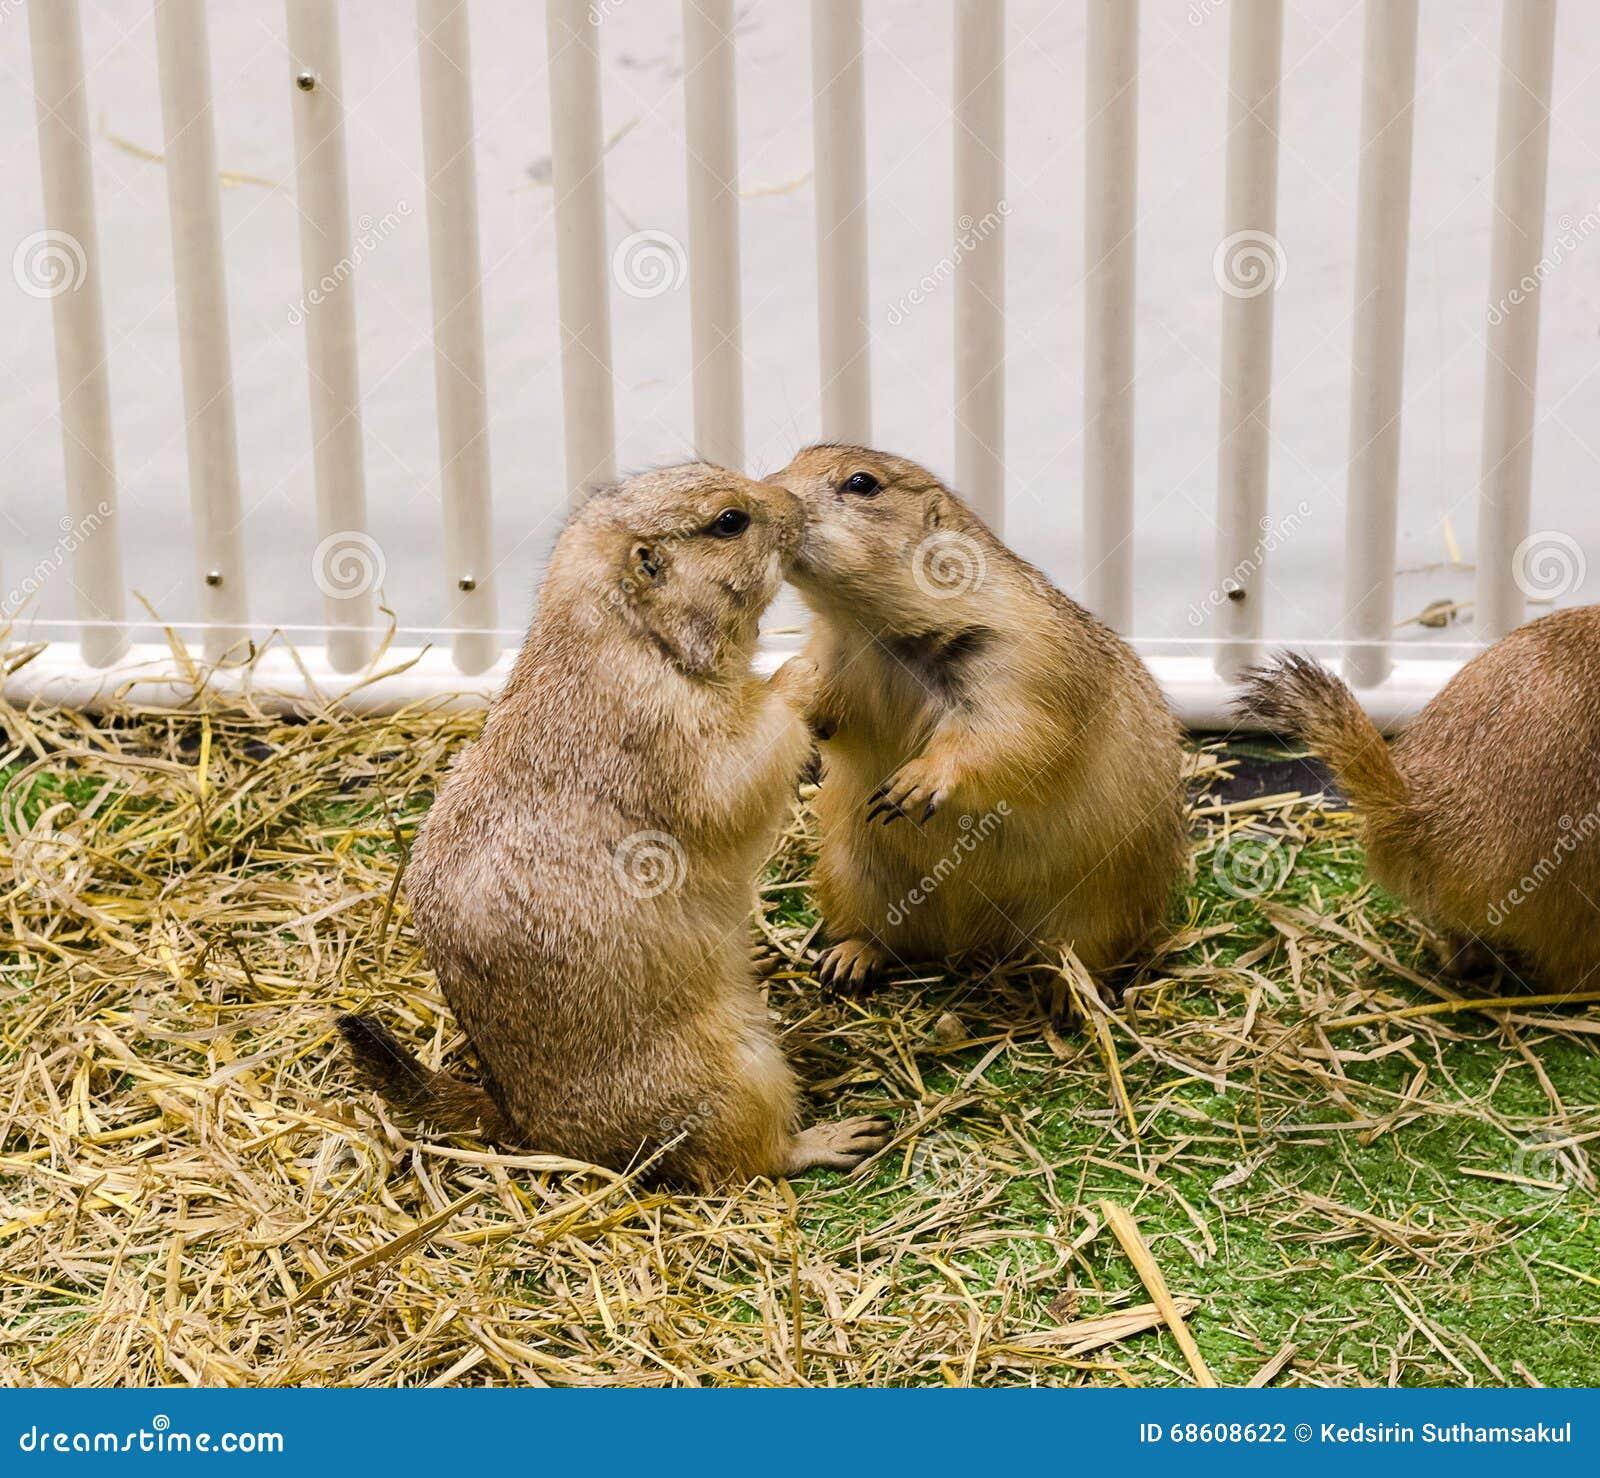 Prairie dog kiss for greeting stock photo image of squirrel download prairie dog kiss for greeting stock photo image of squirrel wildlife 68608622 m4hsunfo